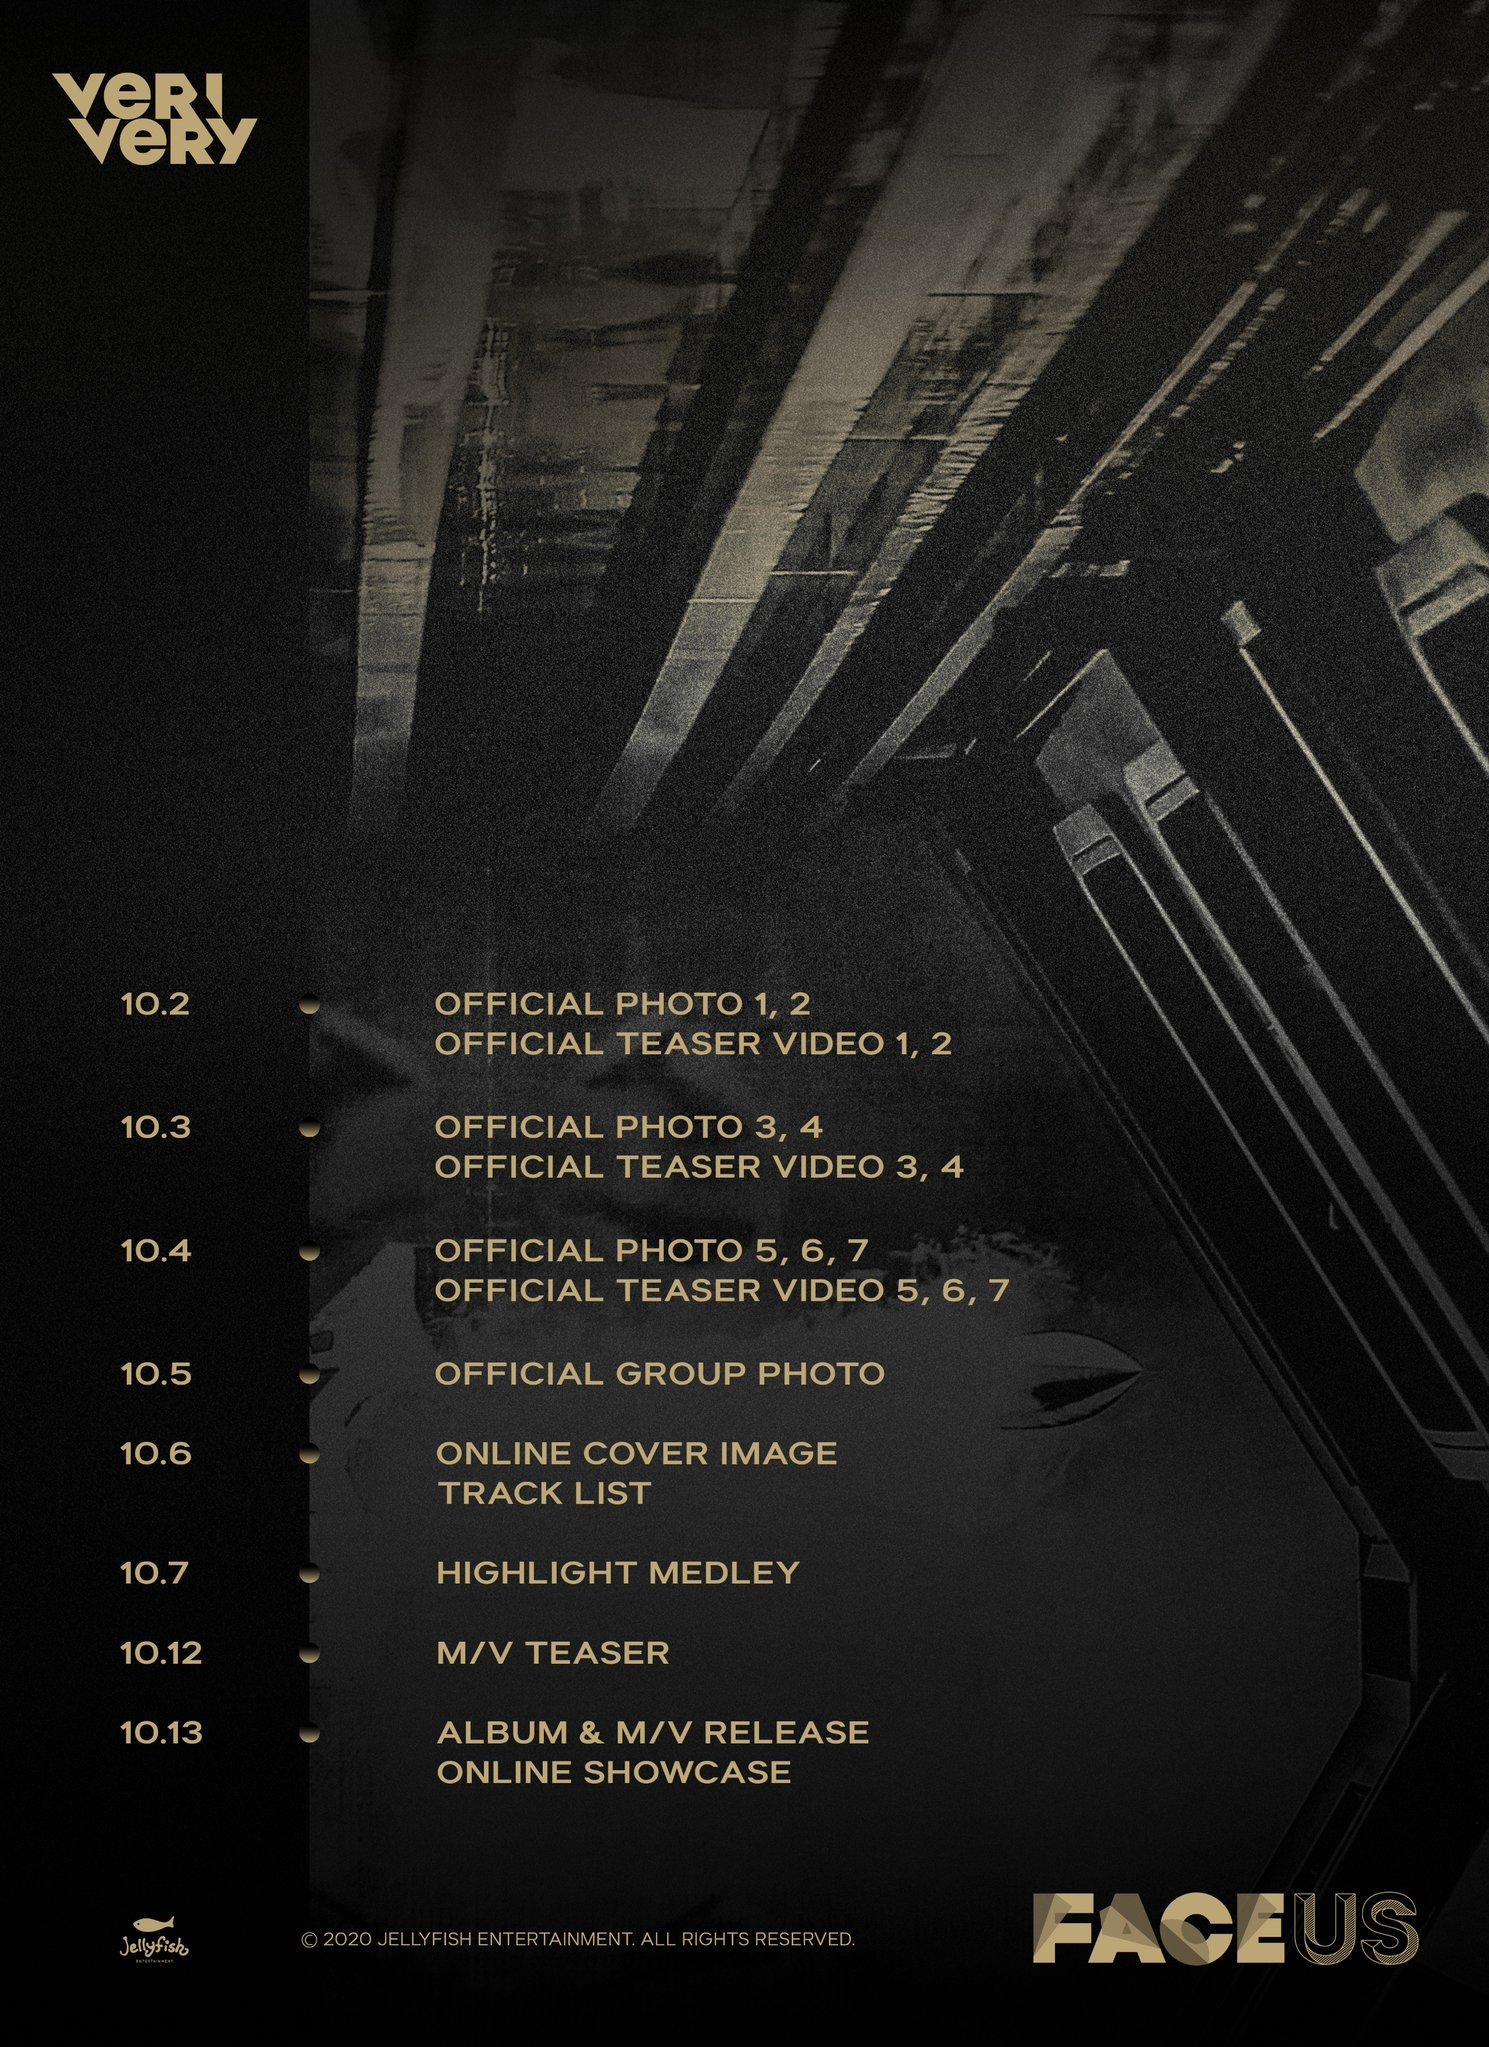 VERIVERY Teaser Schedule